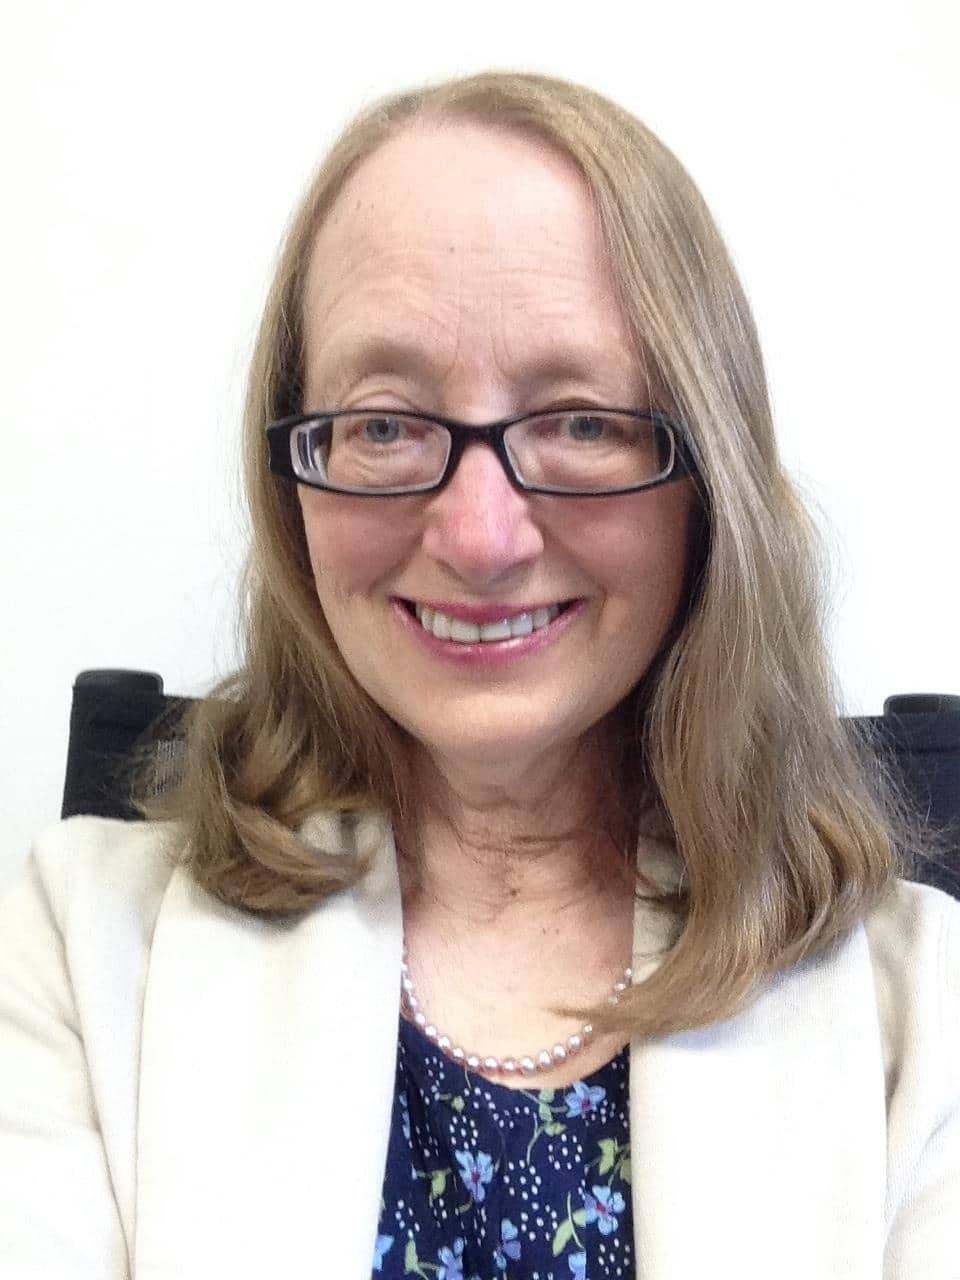 Susan Mannino - talent scout for Allentown, PA.